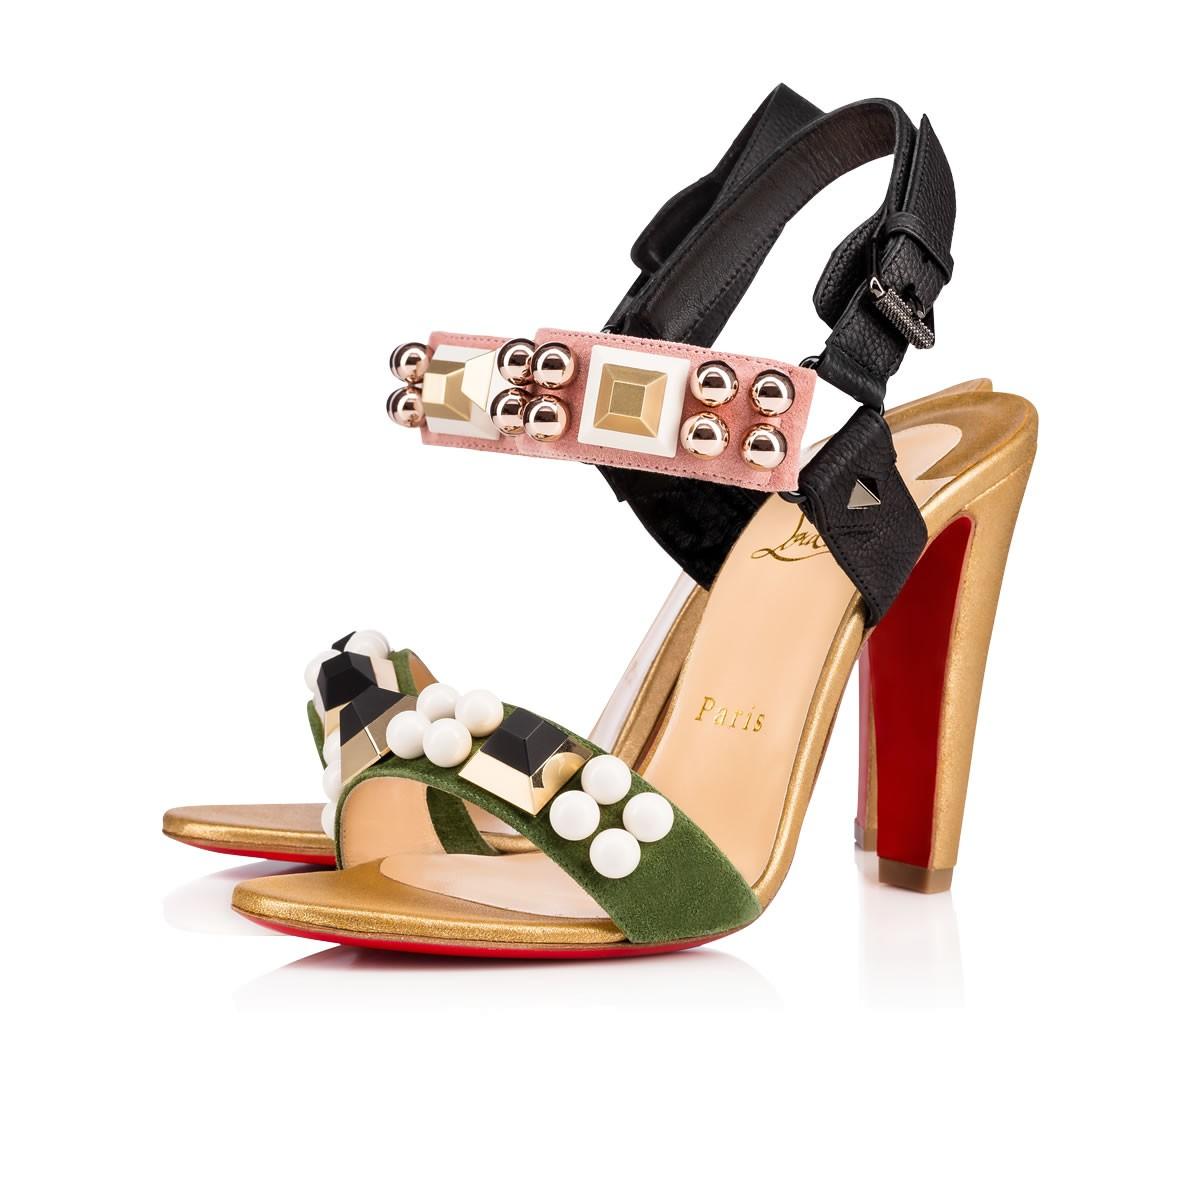 Christian Louboutin Pyrabubble heels